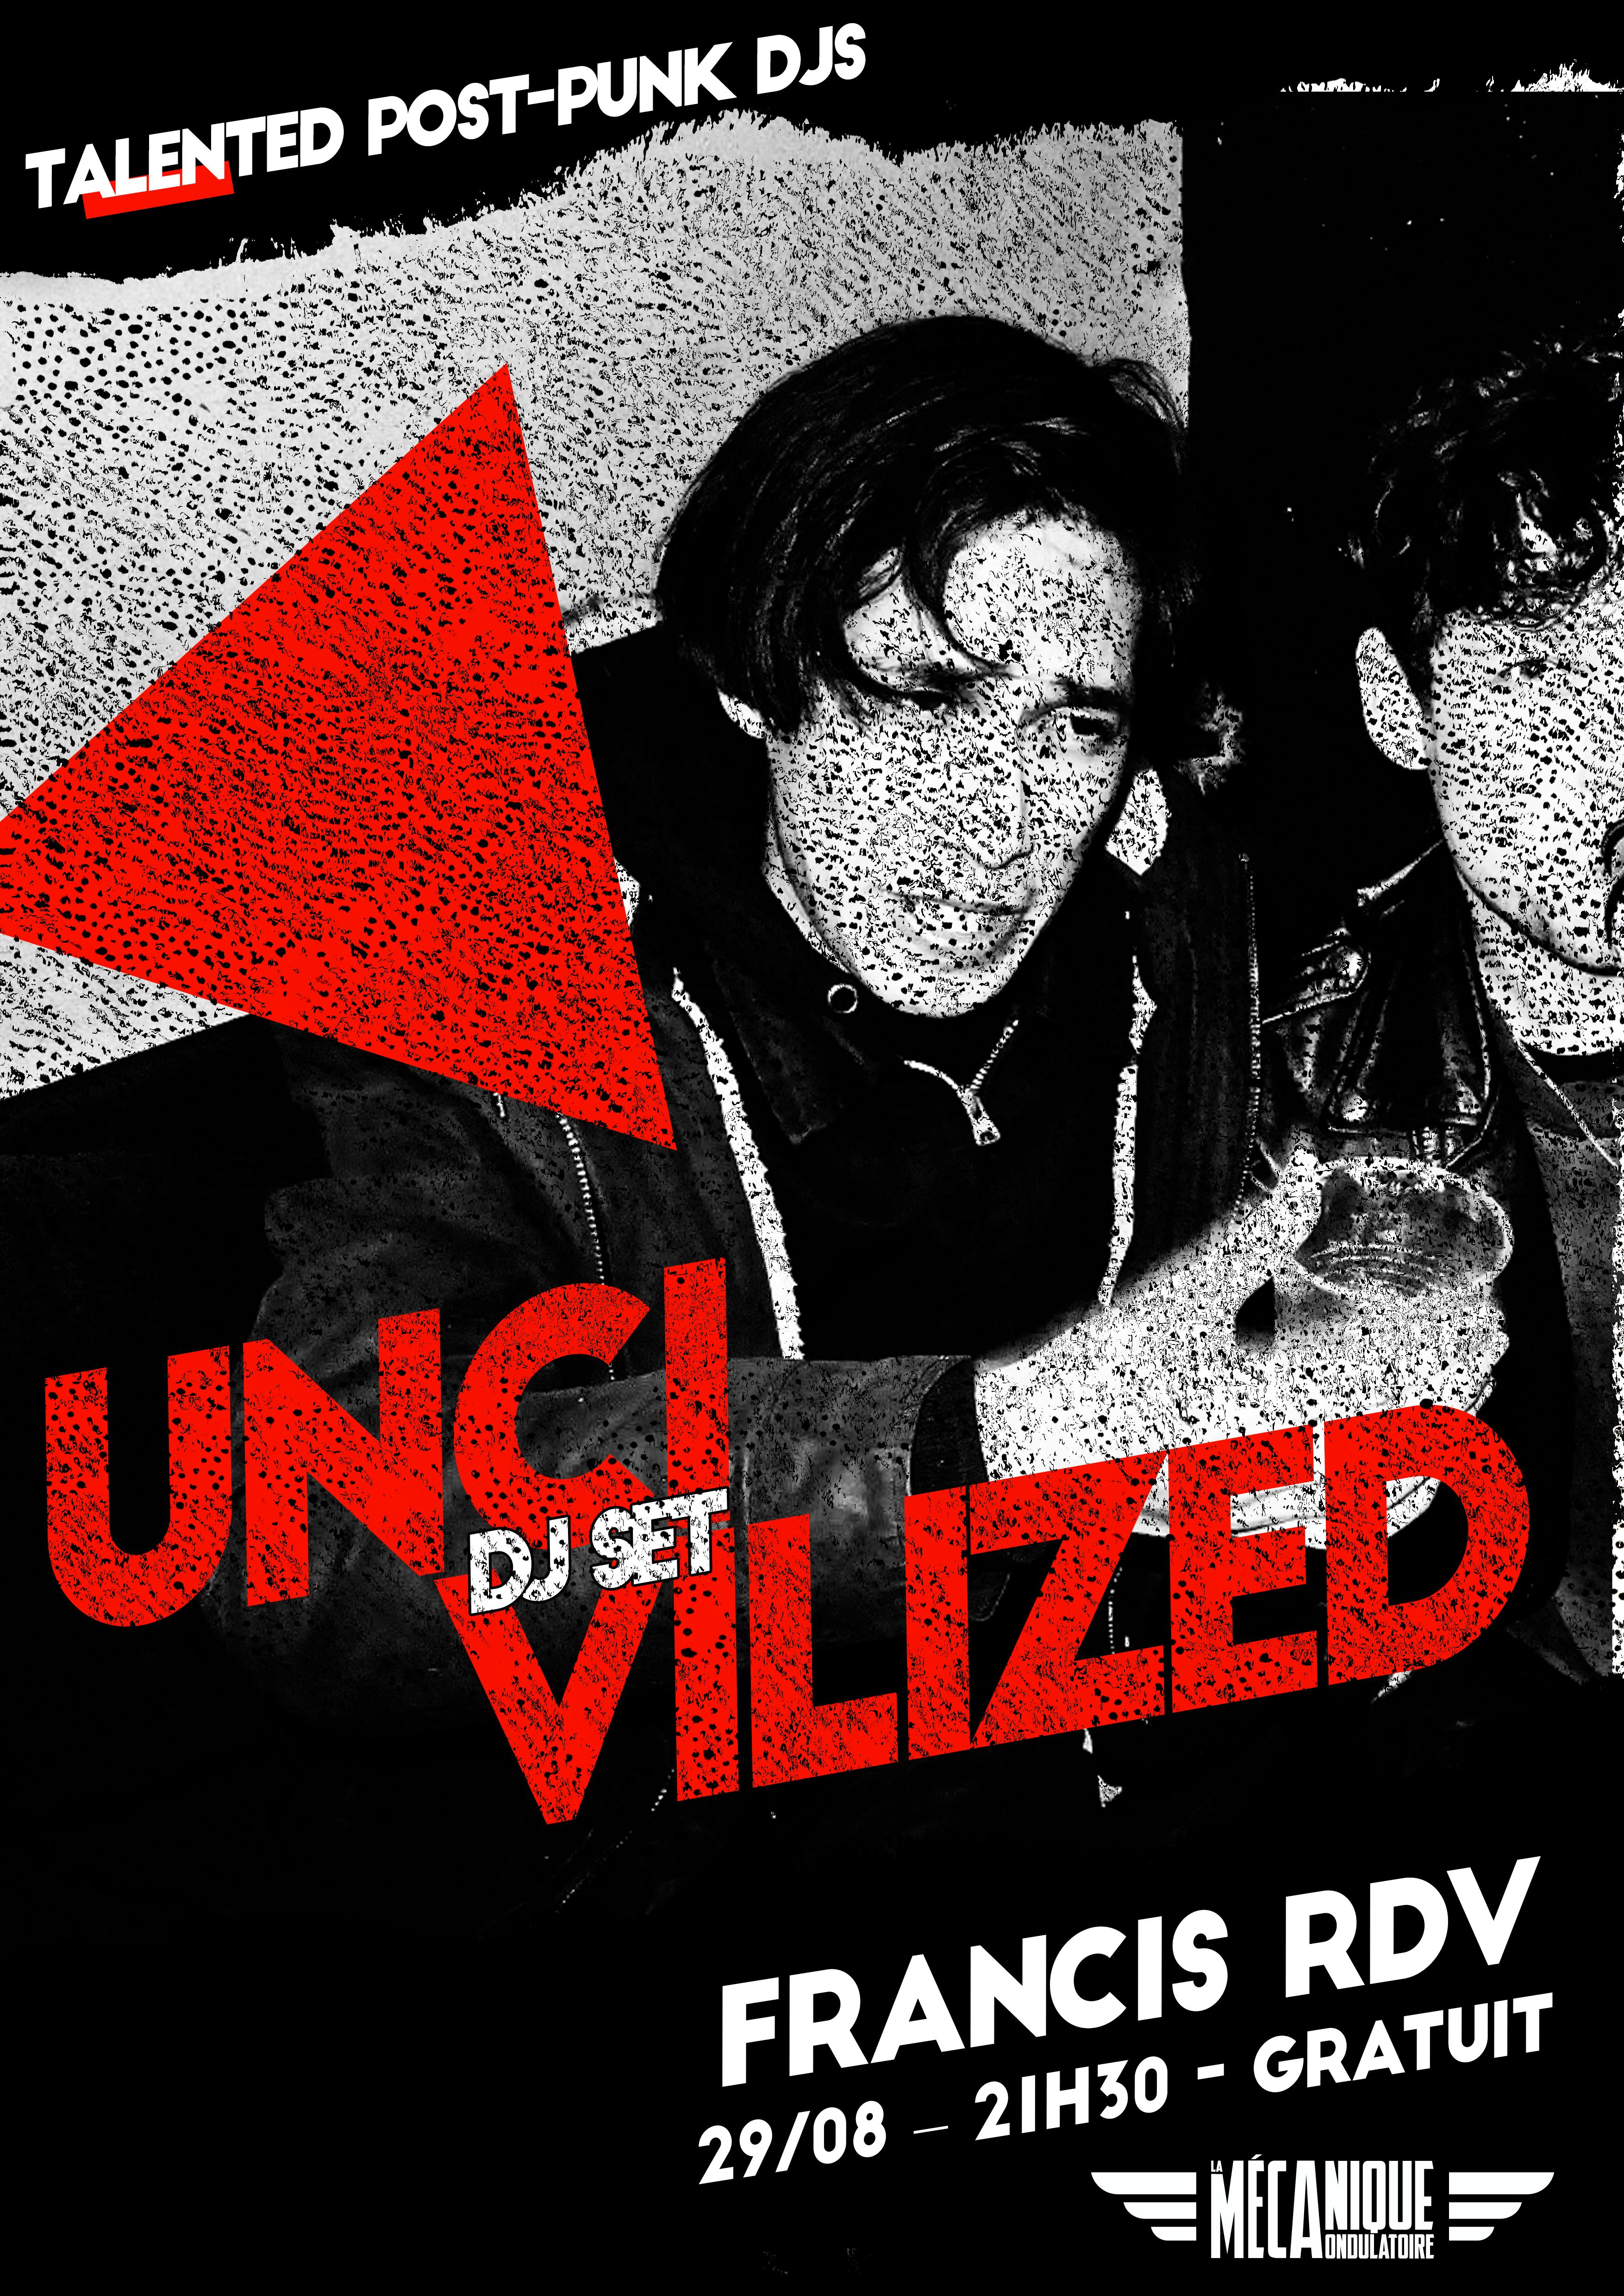 Uncivilized #11 - Francis RDV - Méca 29.08